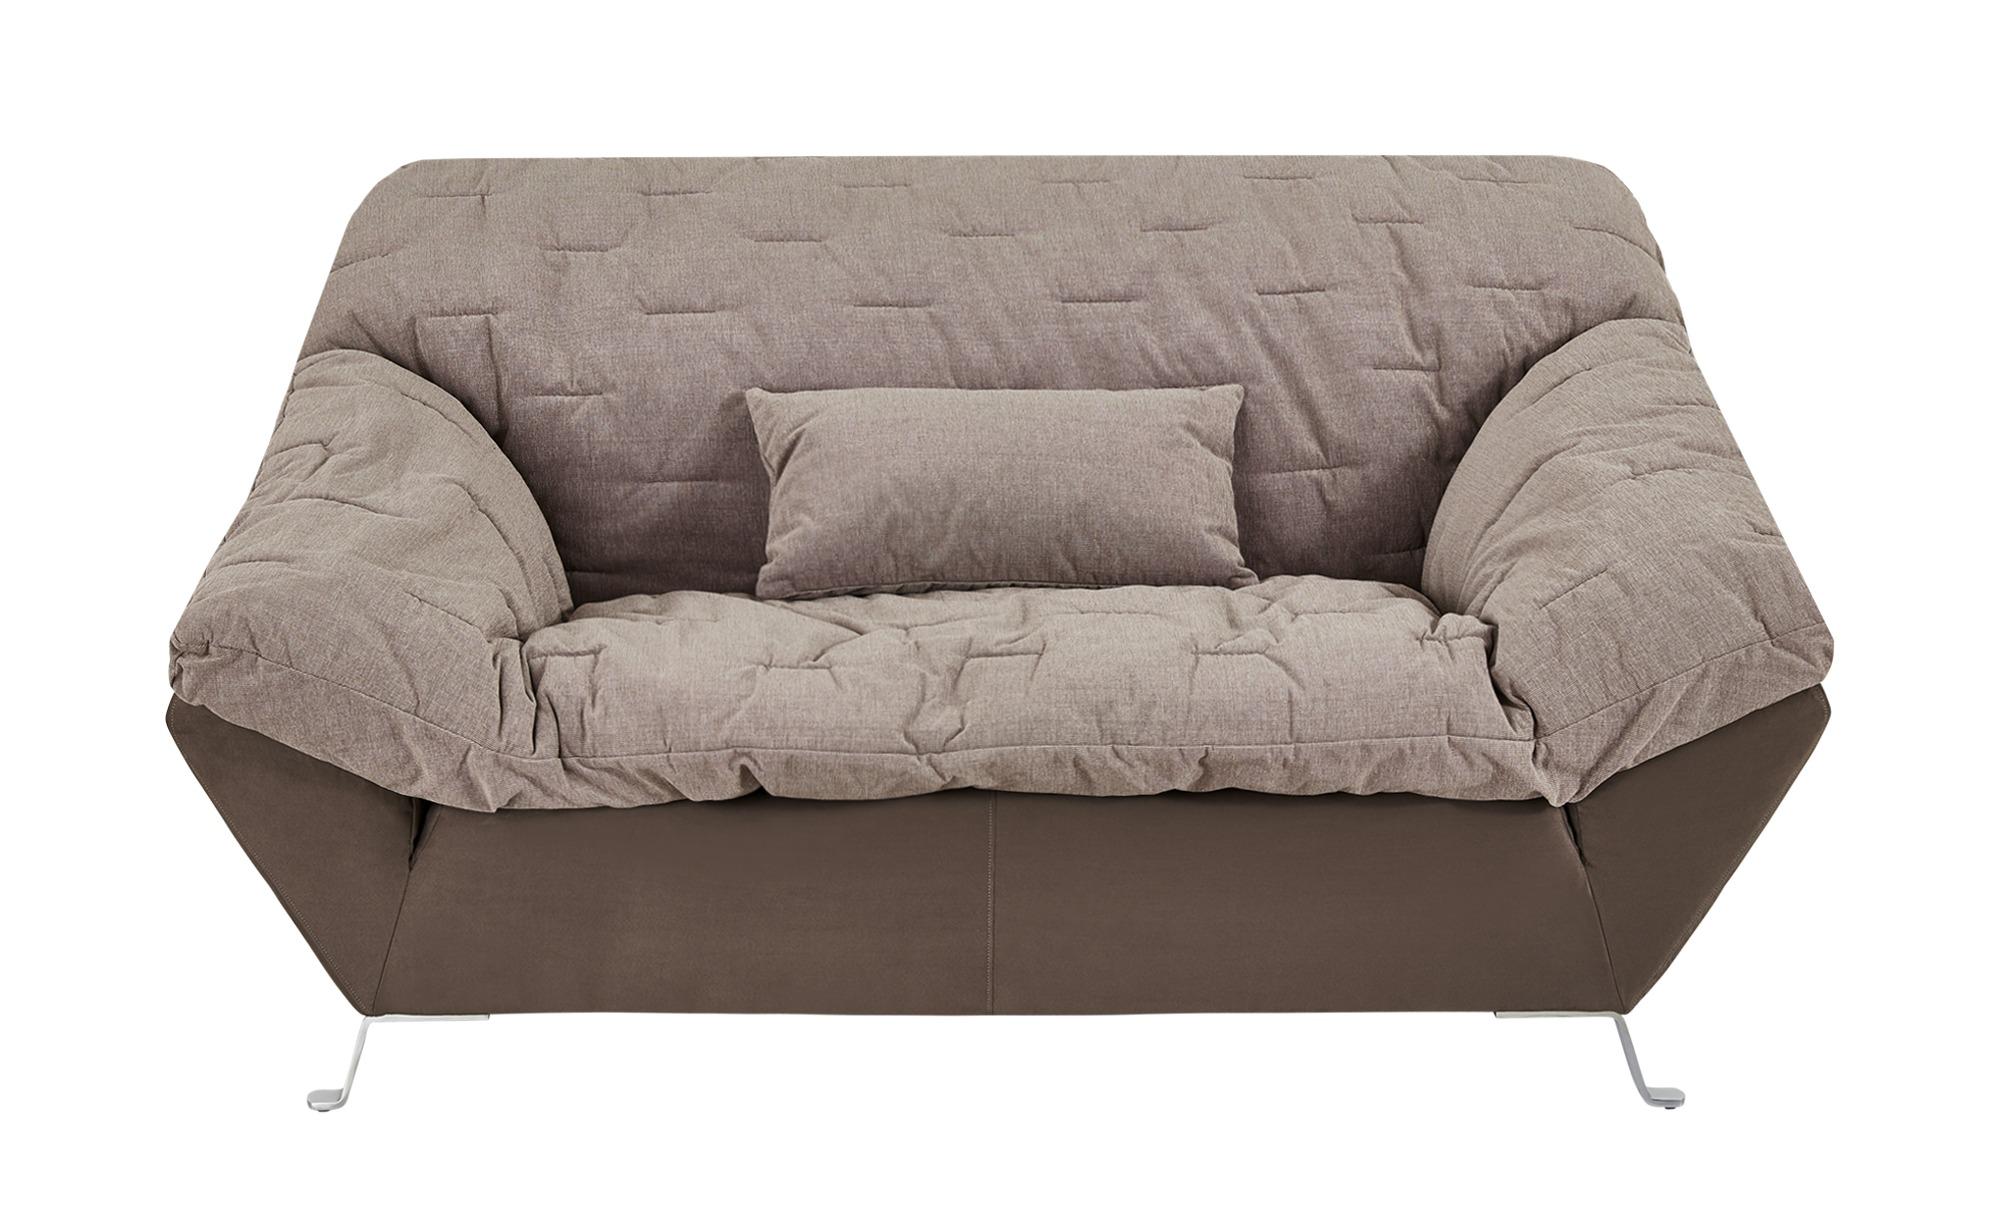 Sofa   Cher ¦ grau ¦ Maße (cm): B: 172 H: 86 T: 105 Polstermöbel > Sofas > 2-Sitzer - Höffner